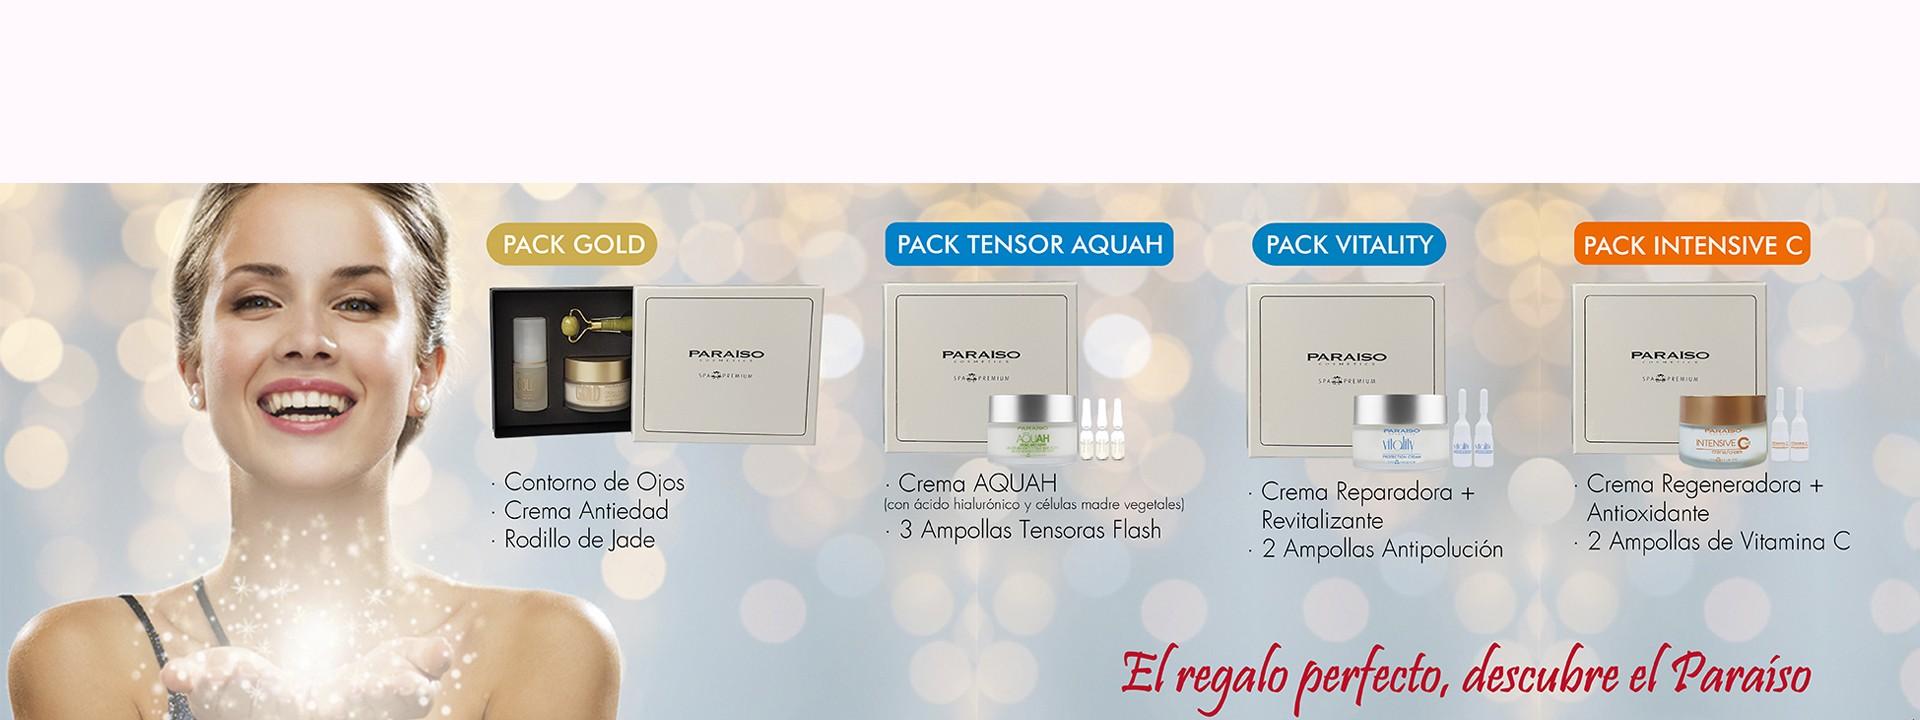 Pack cosmético ideal para regalo